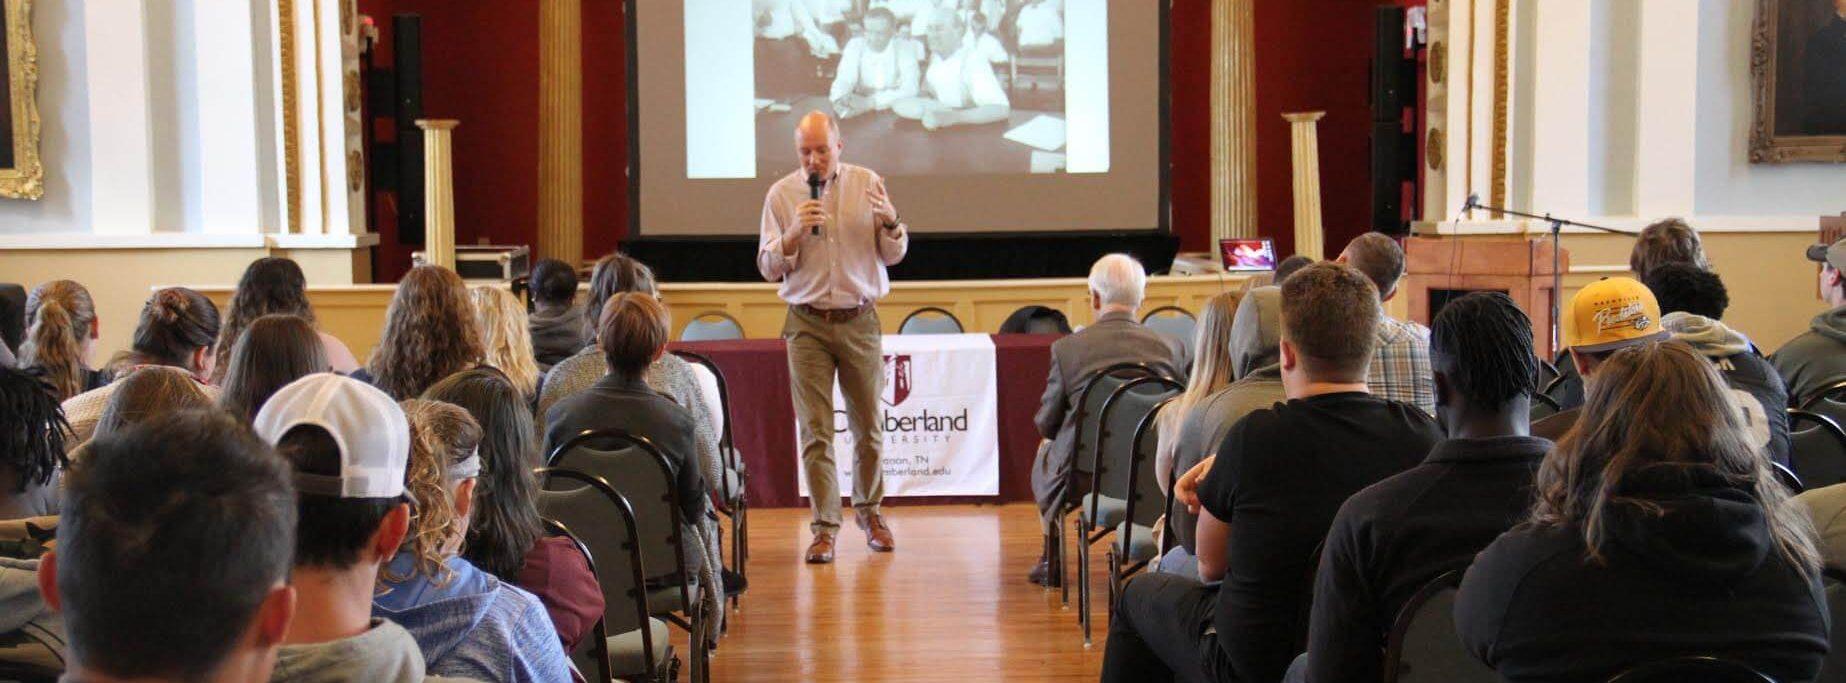 Cumberland speaker giving a presentation